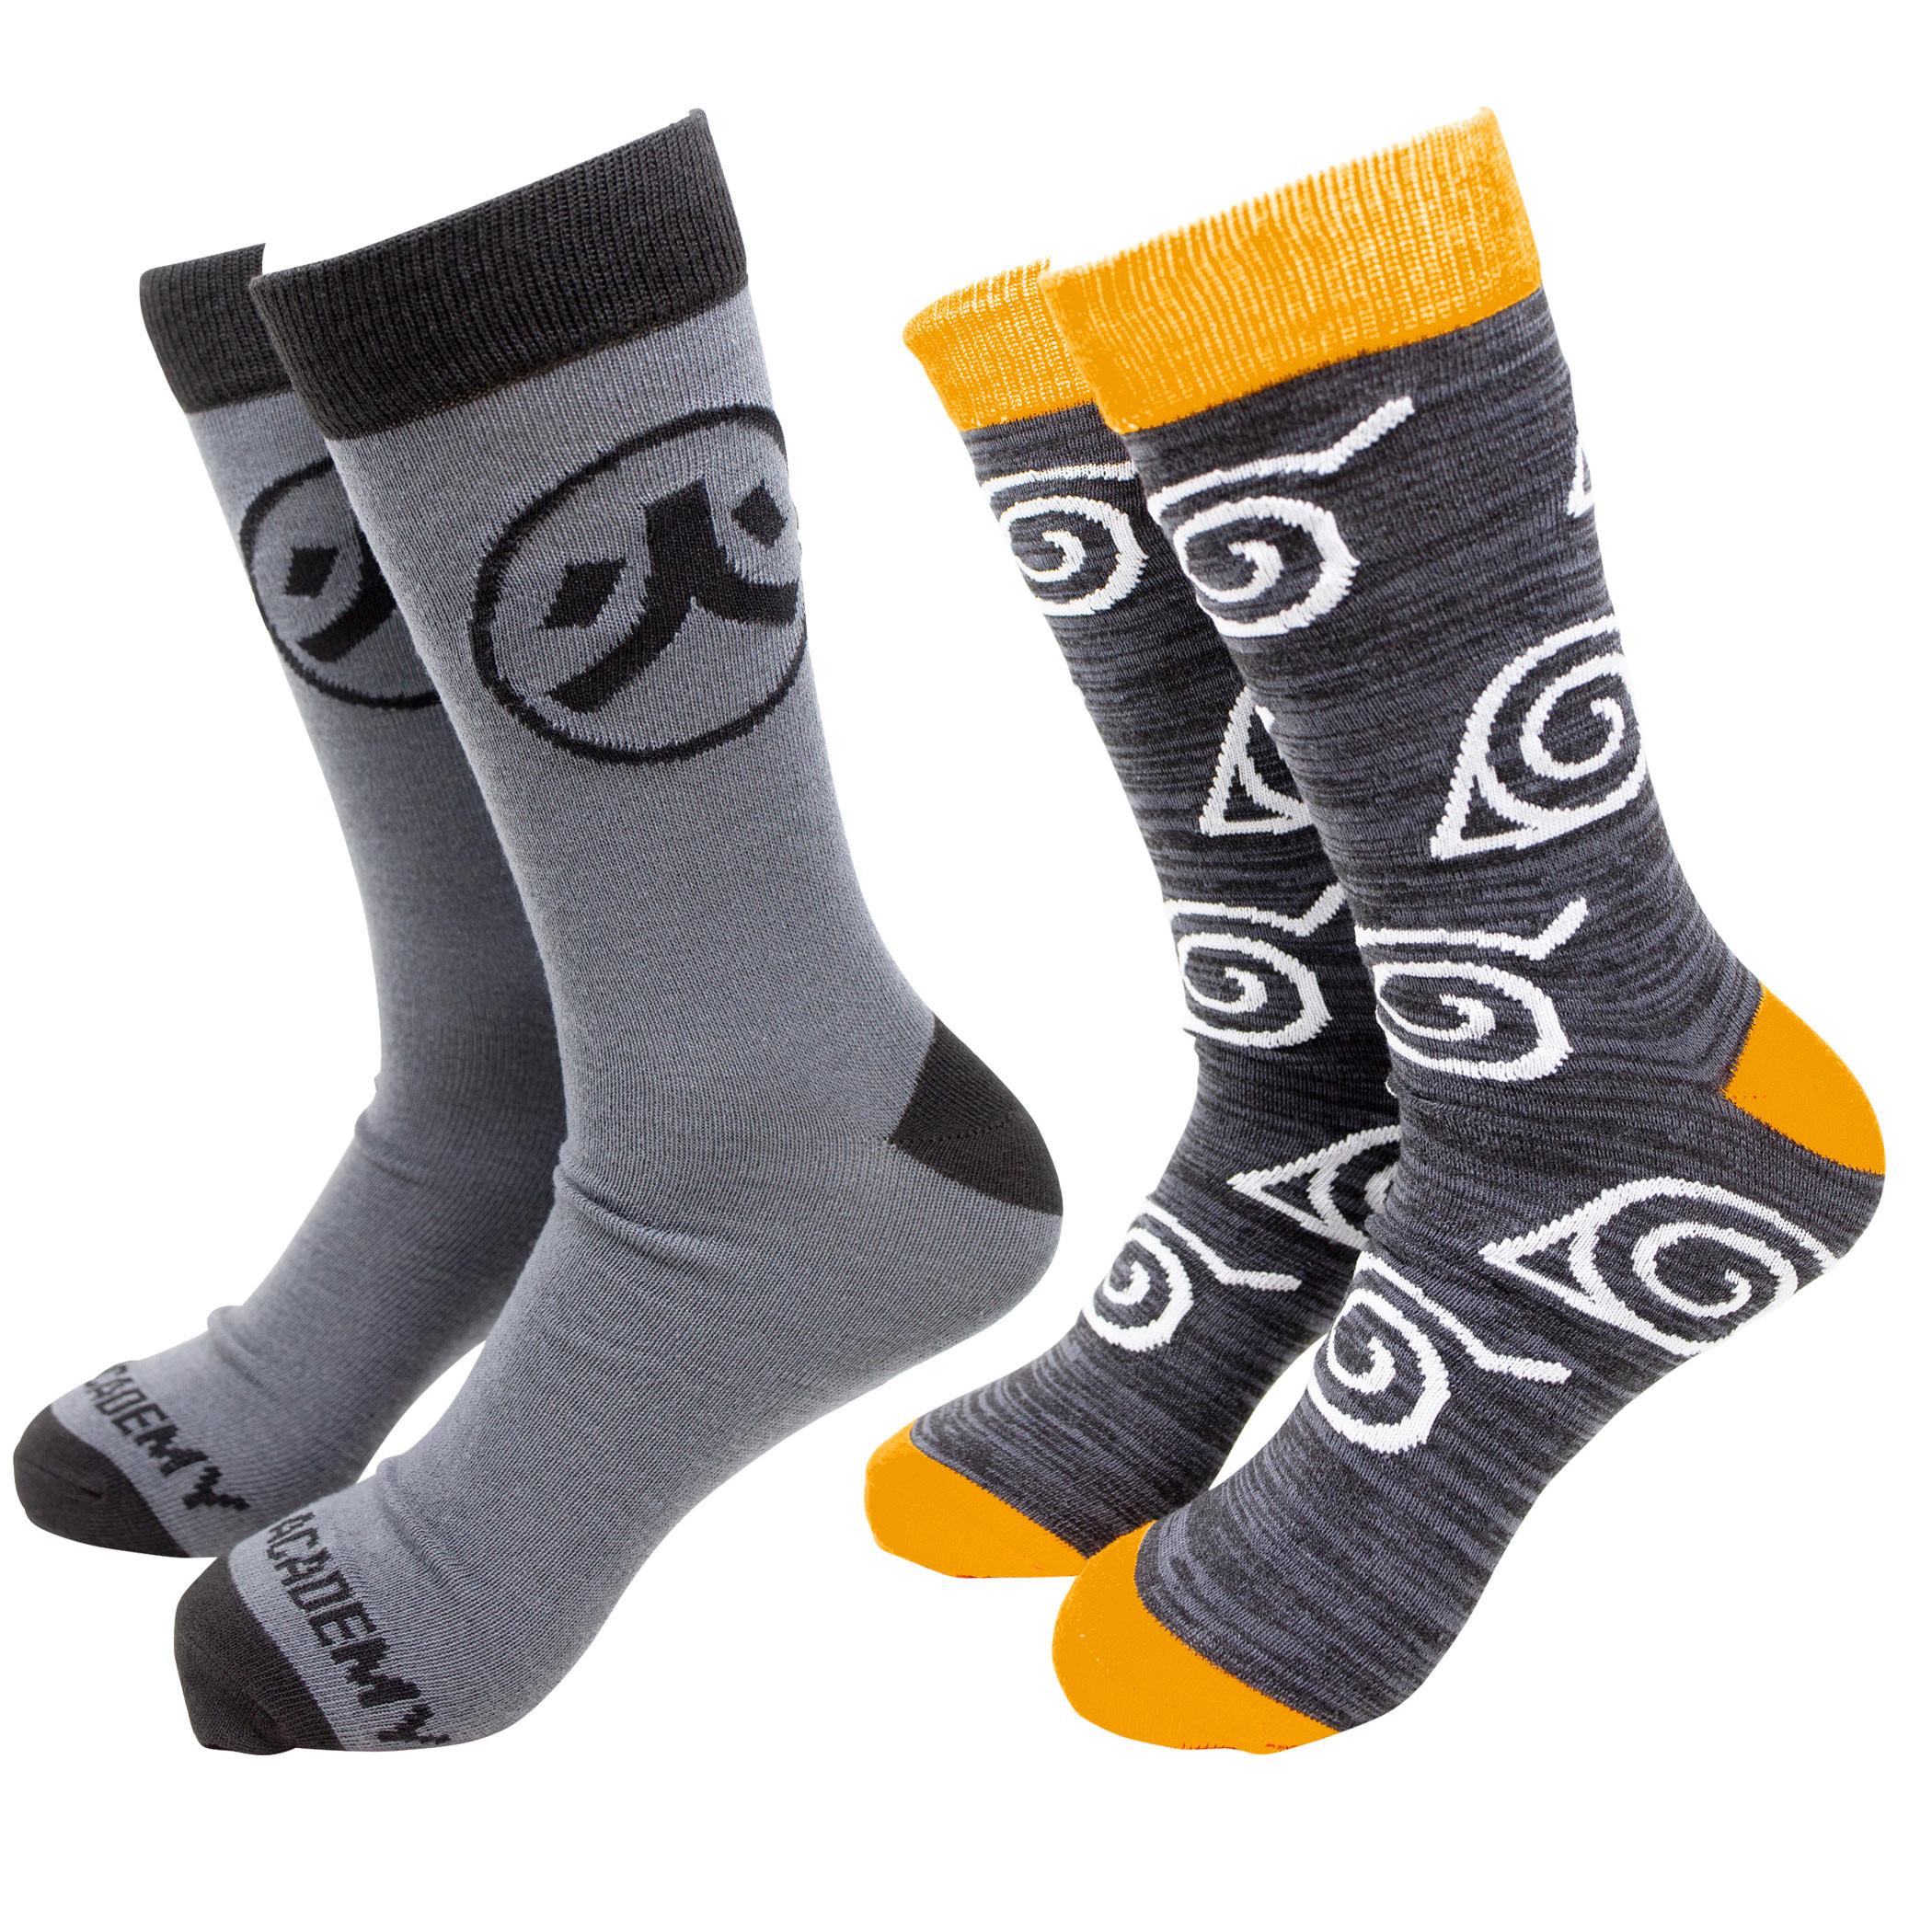 Naruto 2-Pack Crew Socks